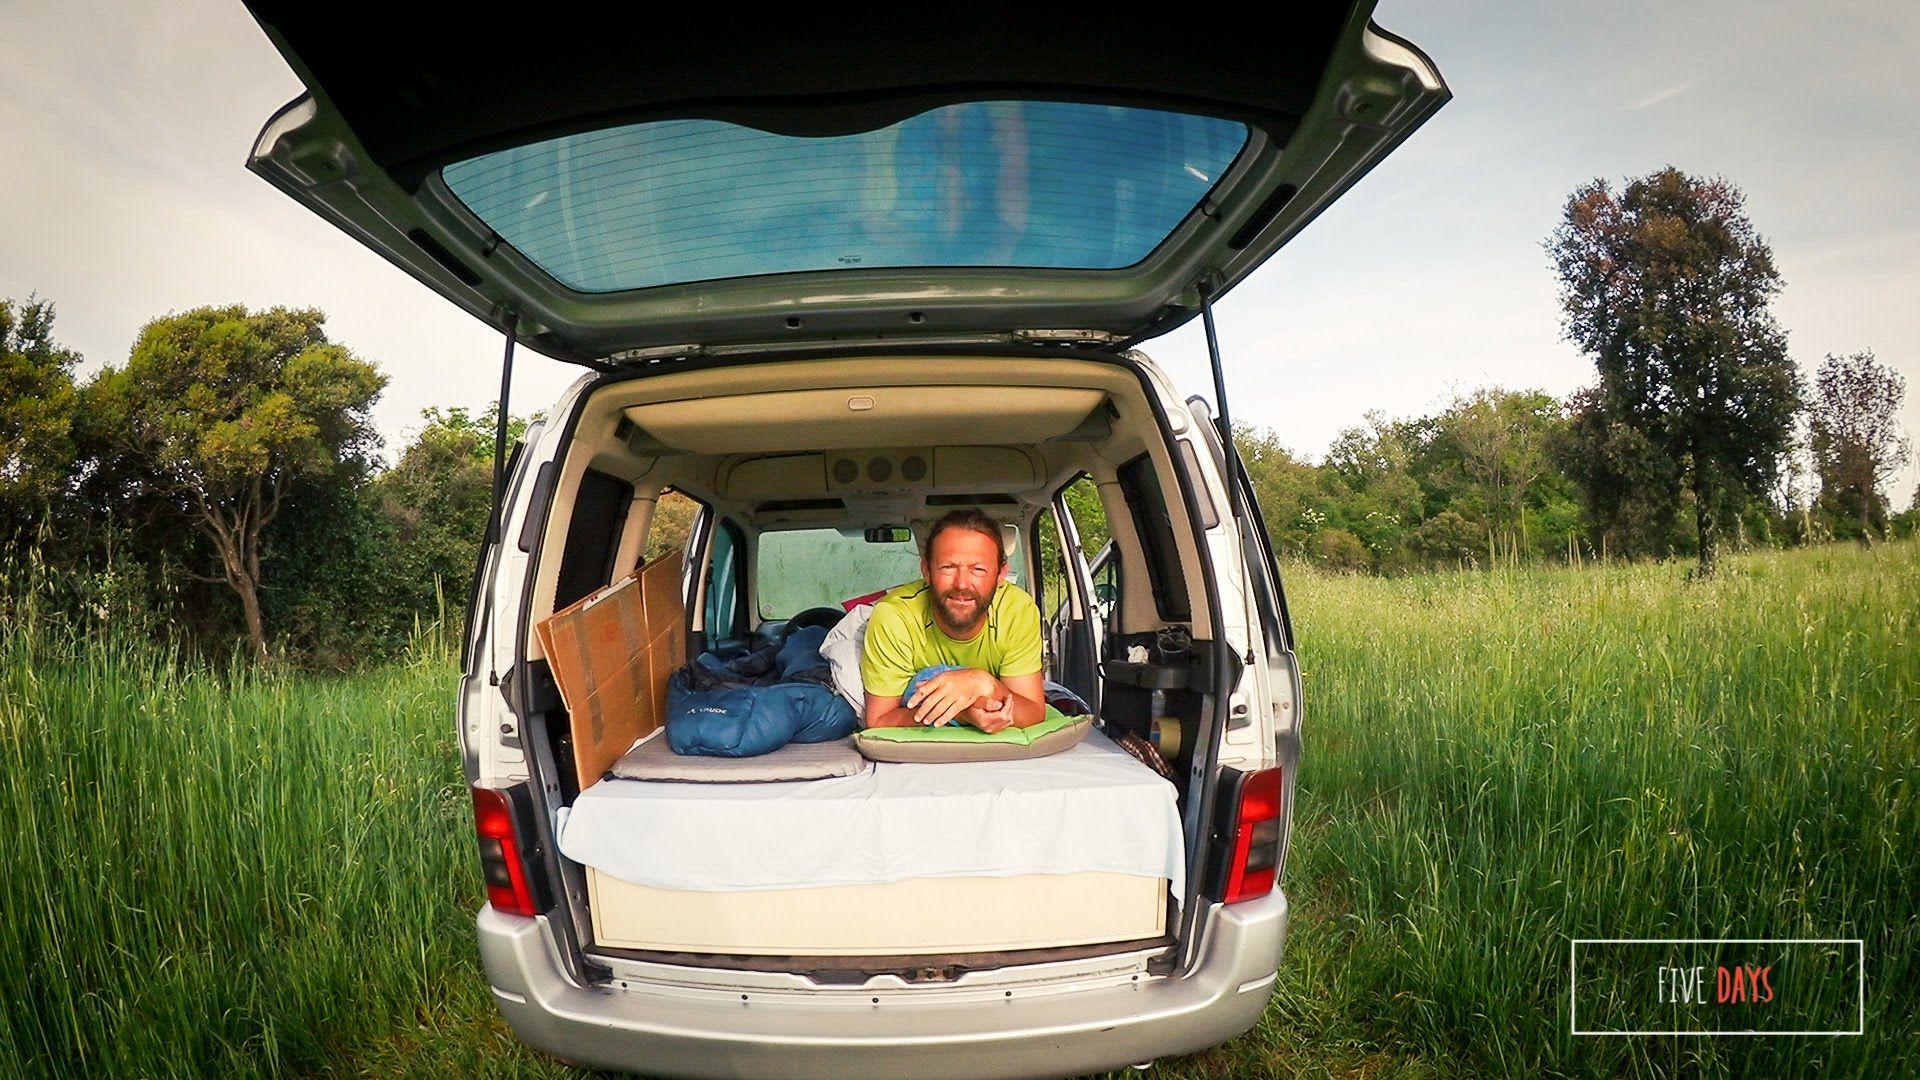 citroen berlingo zum minicamper umgebaut einbau bett. Black Bedroom Furniture Sets. Home Design Ideas